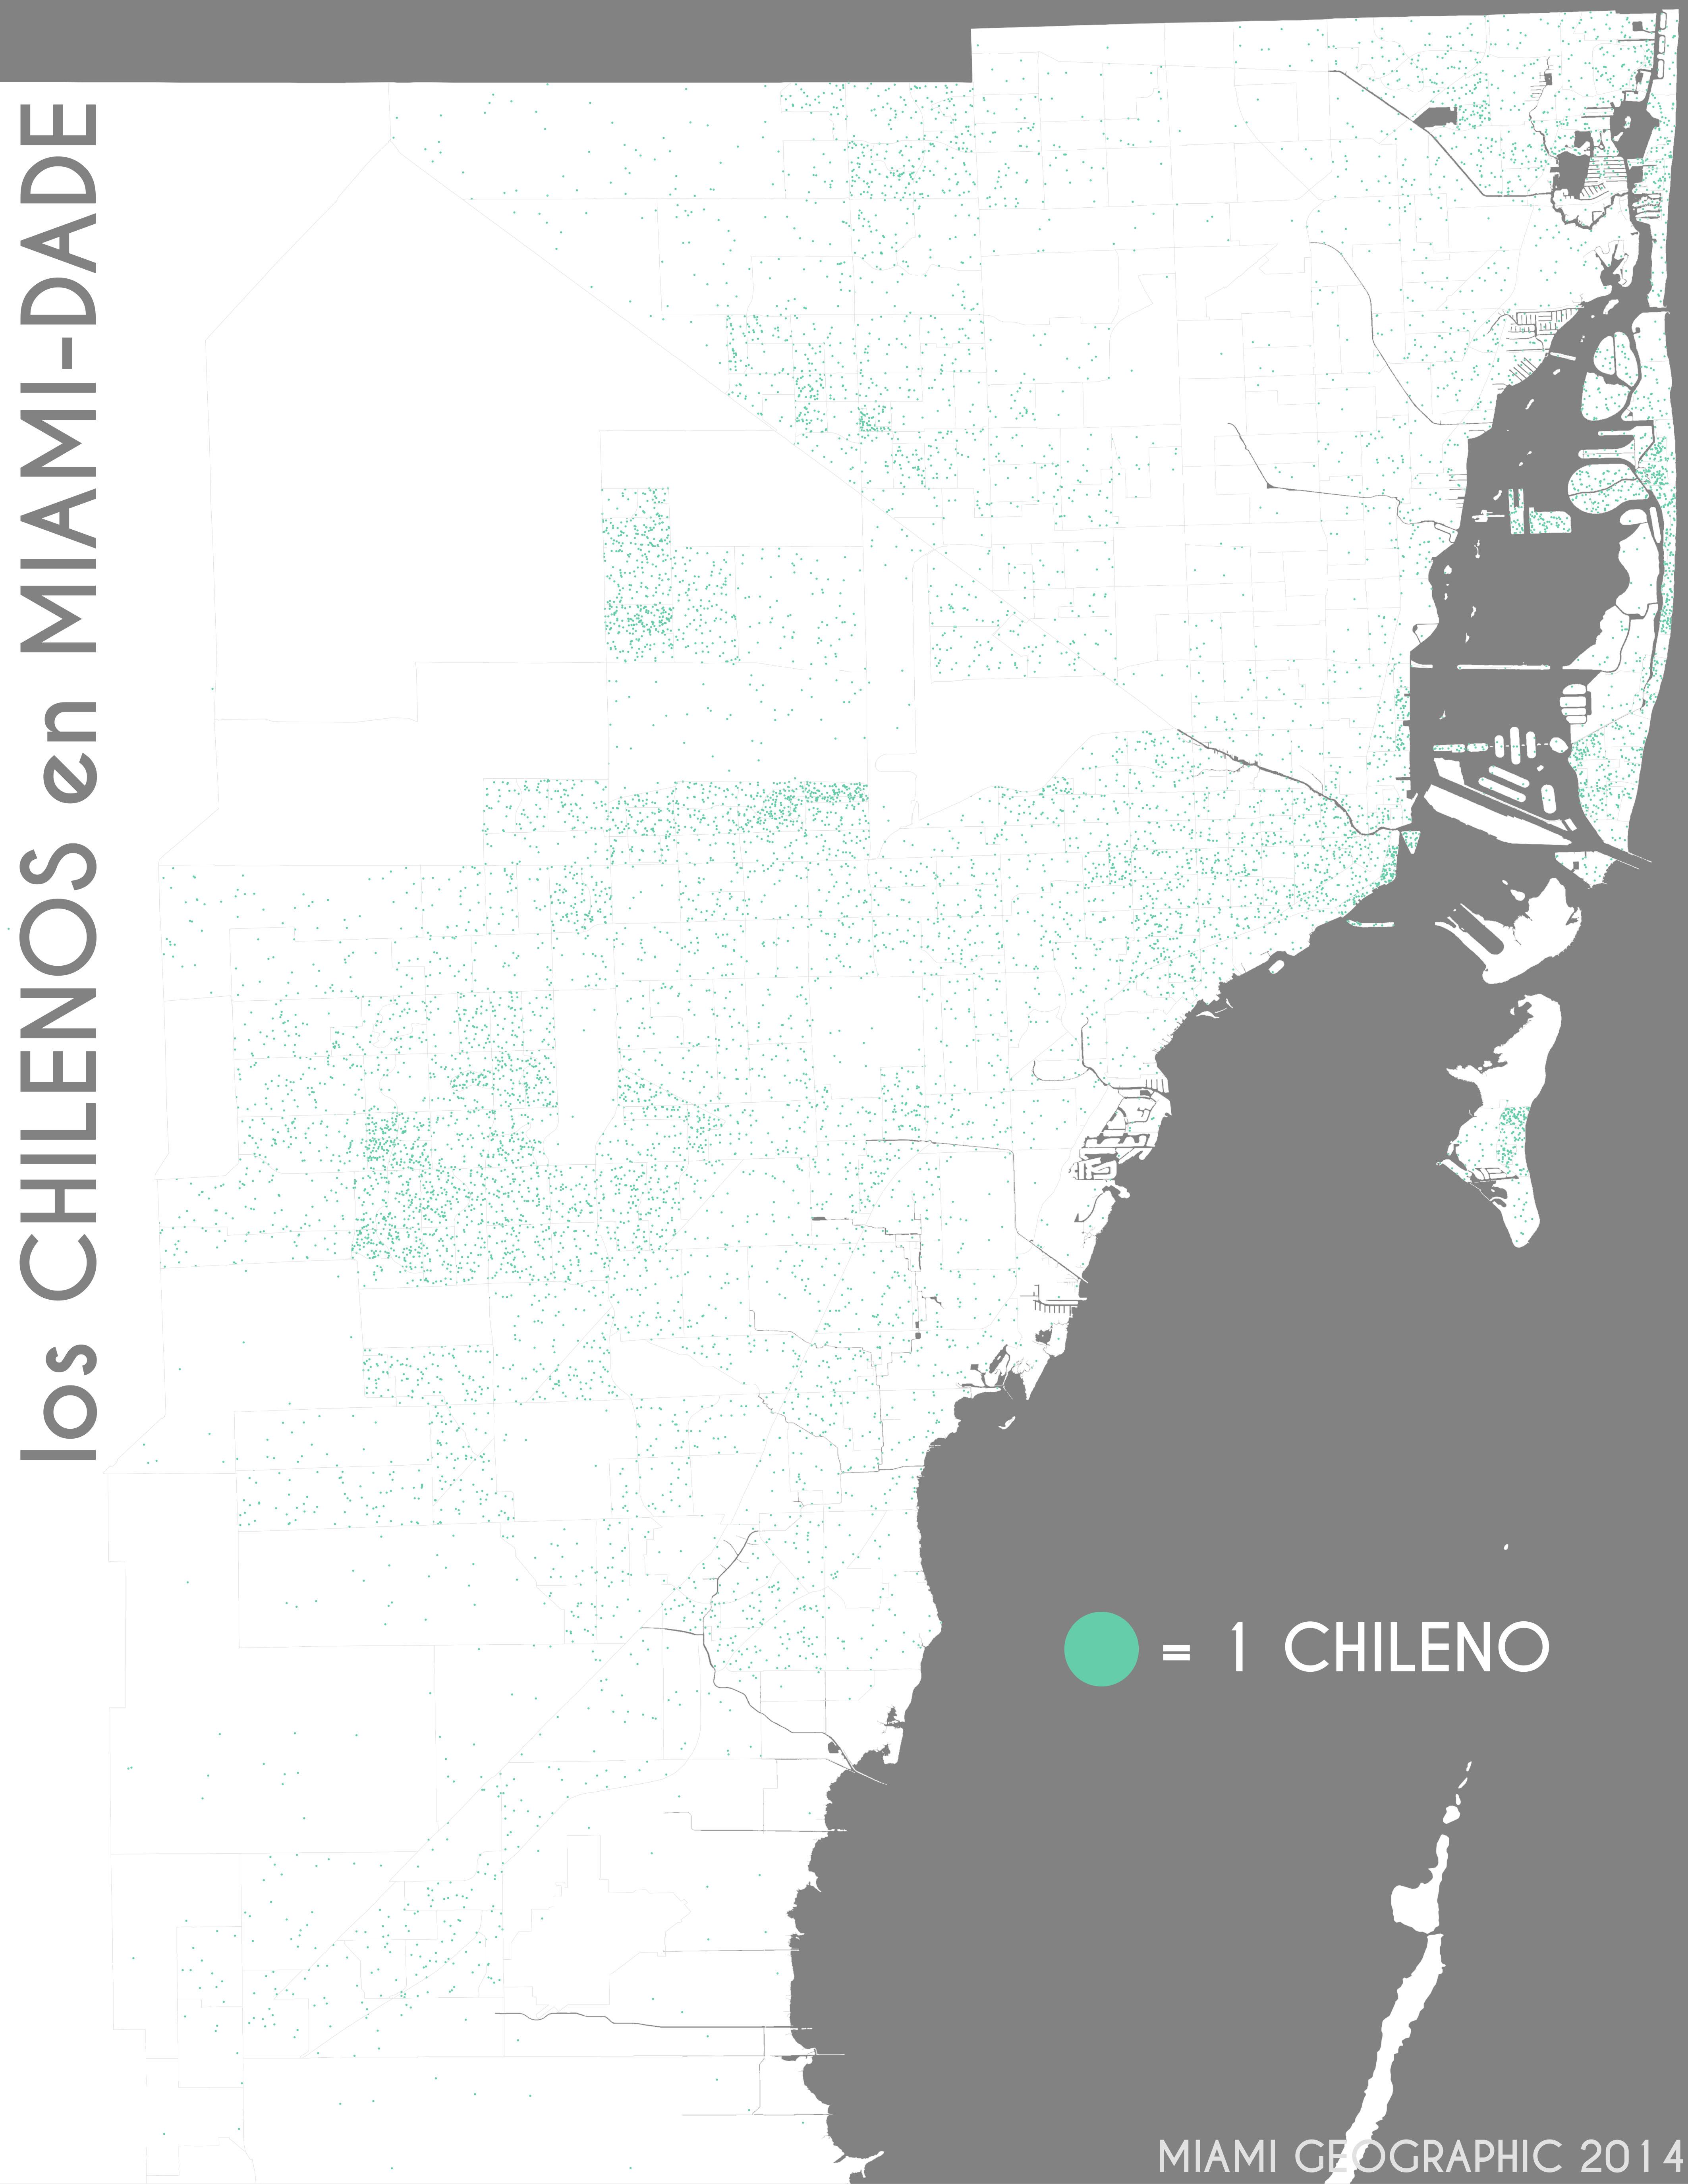 Costa Rica Population Density Map%0A Los chilenos en MiamiDade  Data Source       Decennial Census  Map Source